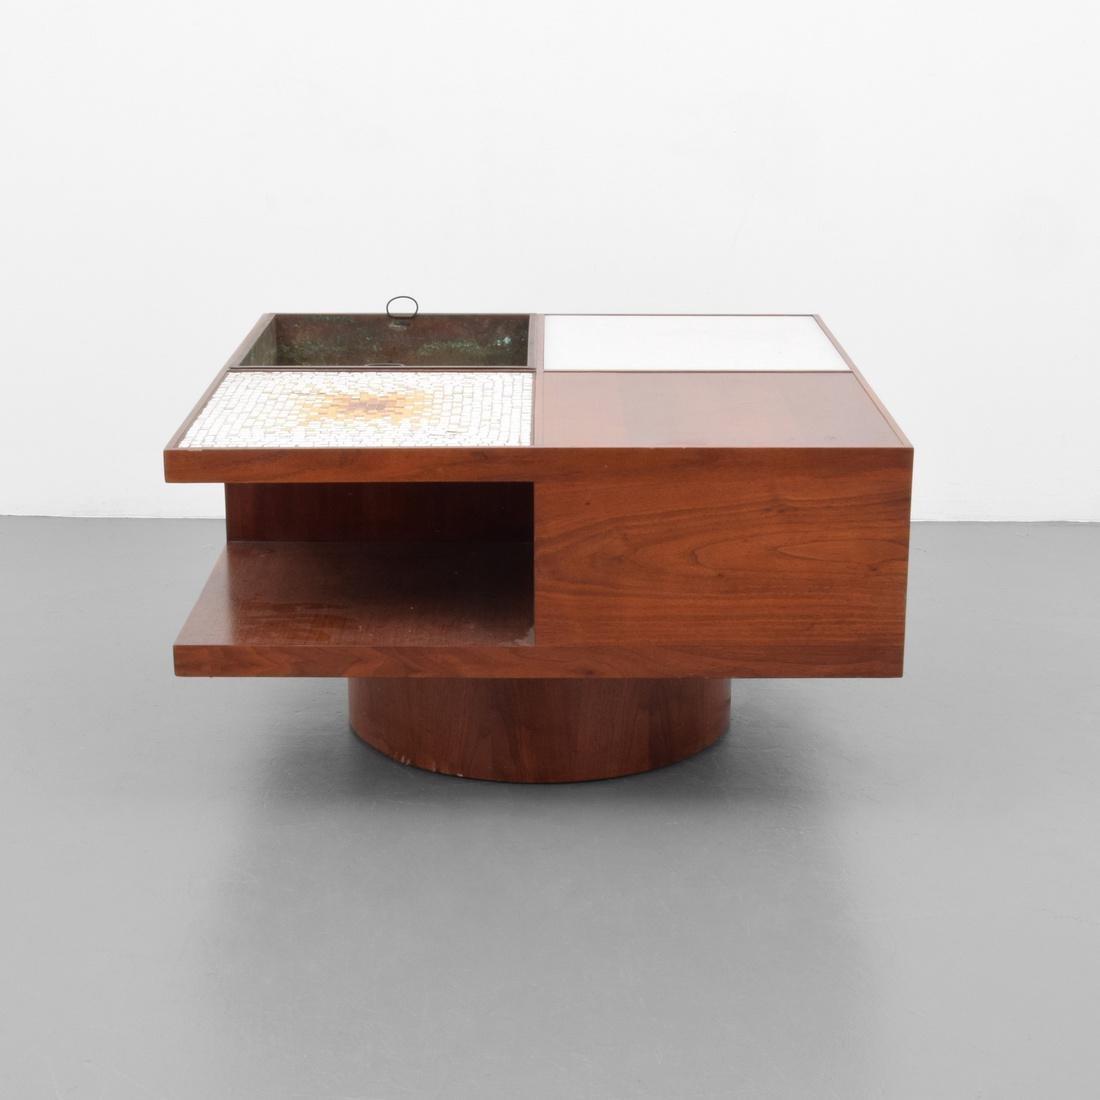 Kagan Lighted Coffee Table Model 440